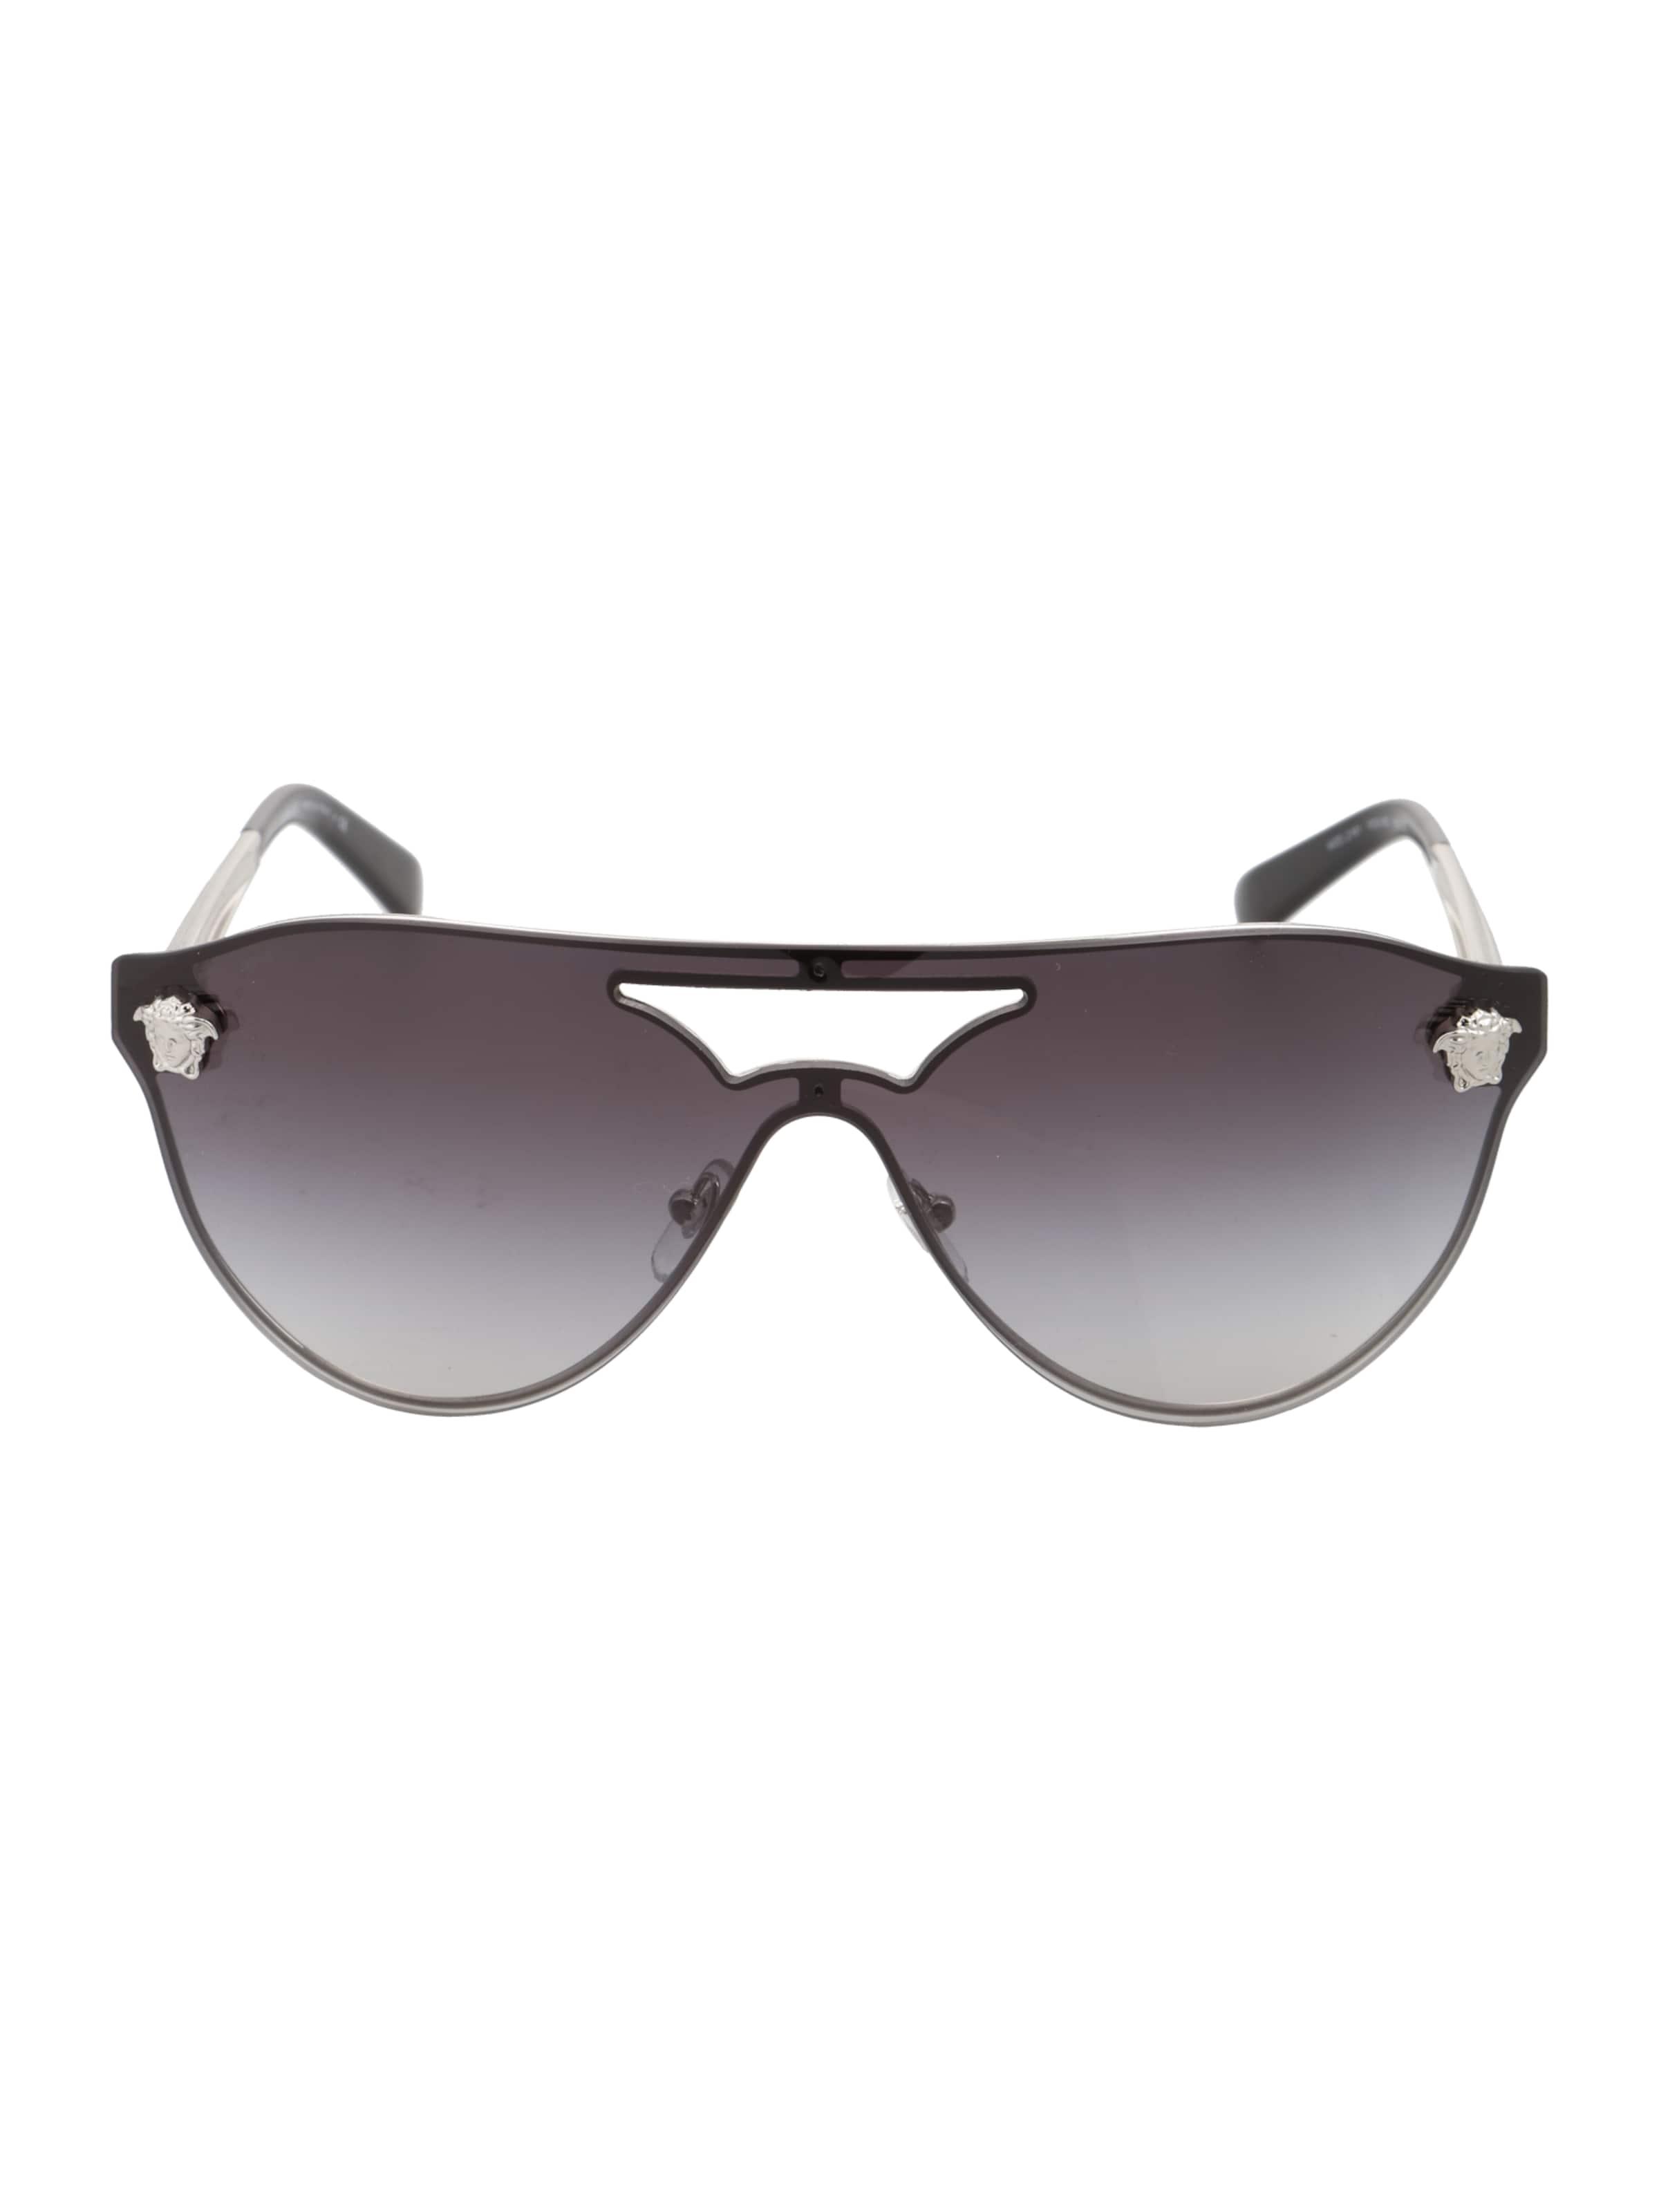 VERSACE Casual Sonnenbrille Angebote Online FC4IH22